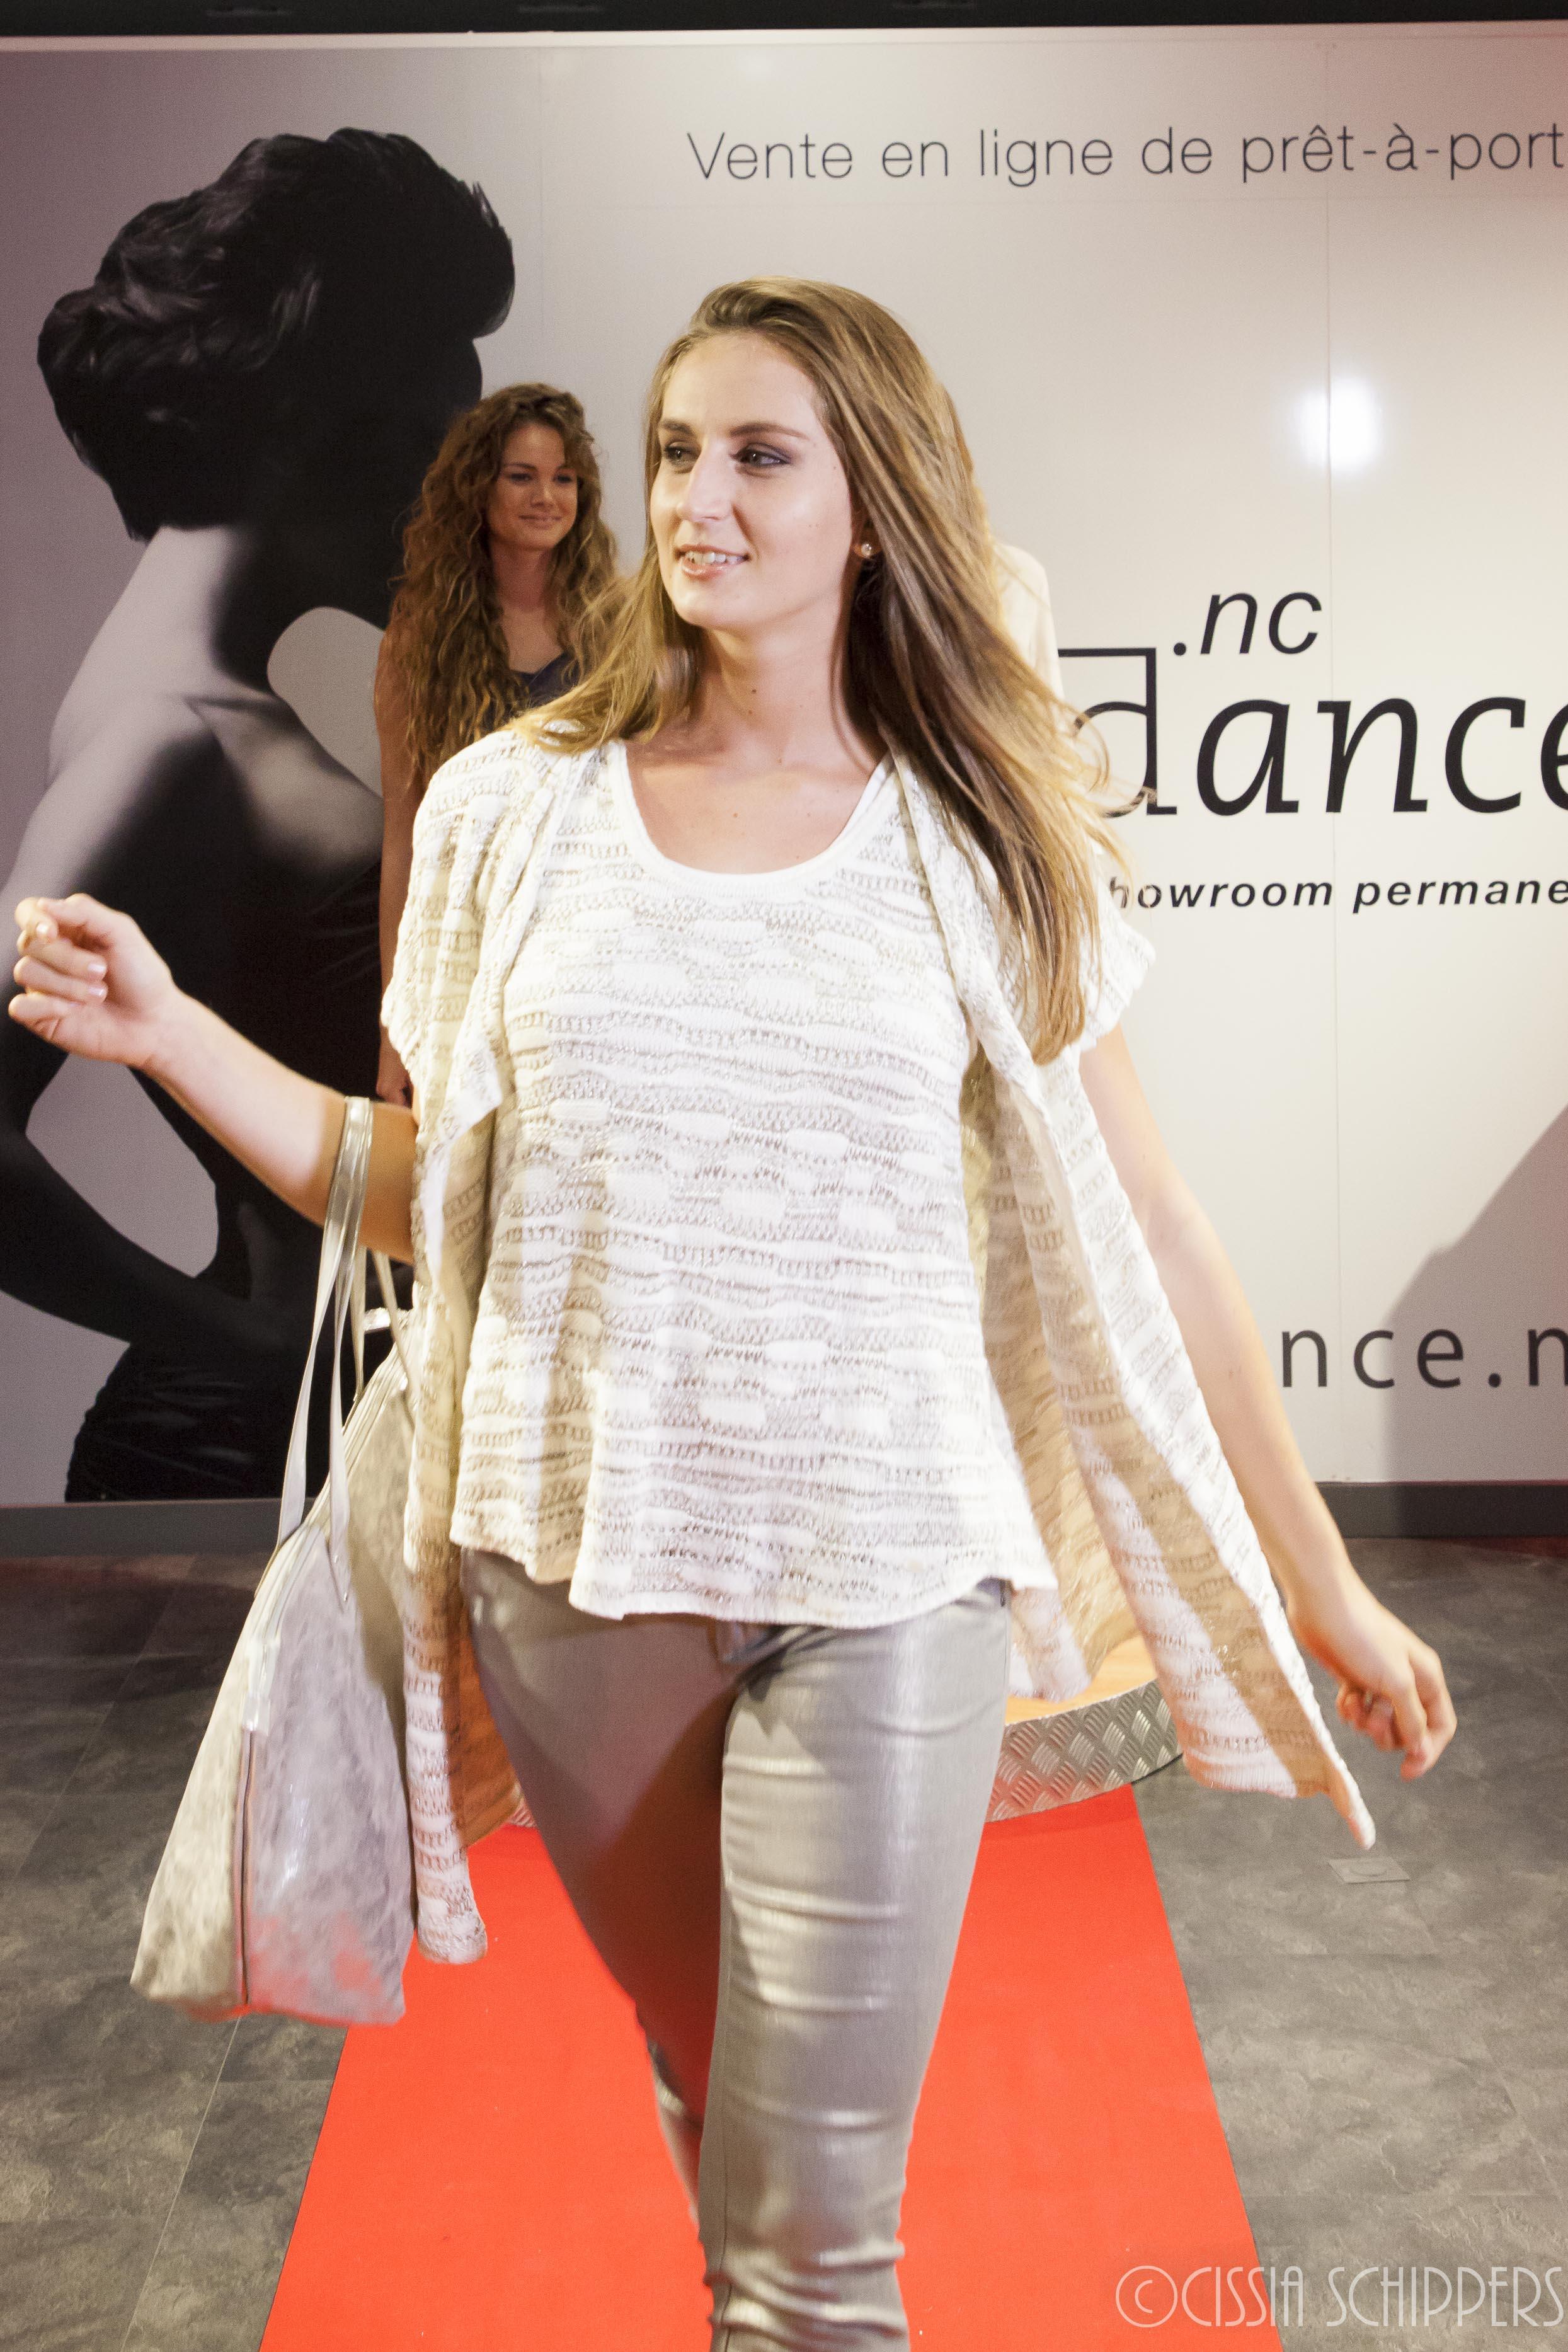 Tendance NC 2017 by Cissia Schippers photographe-7891